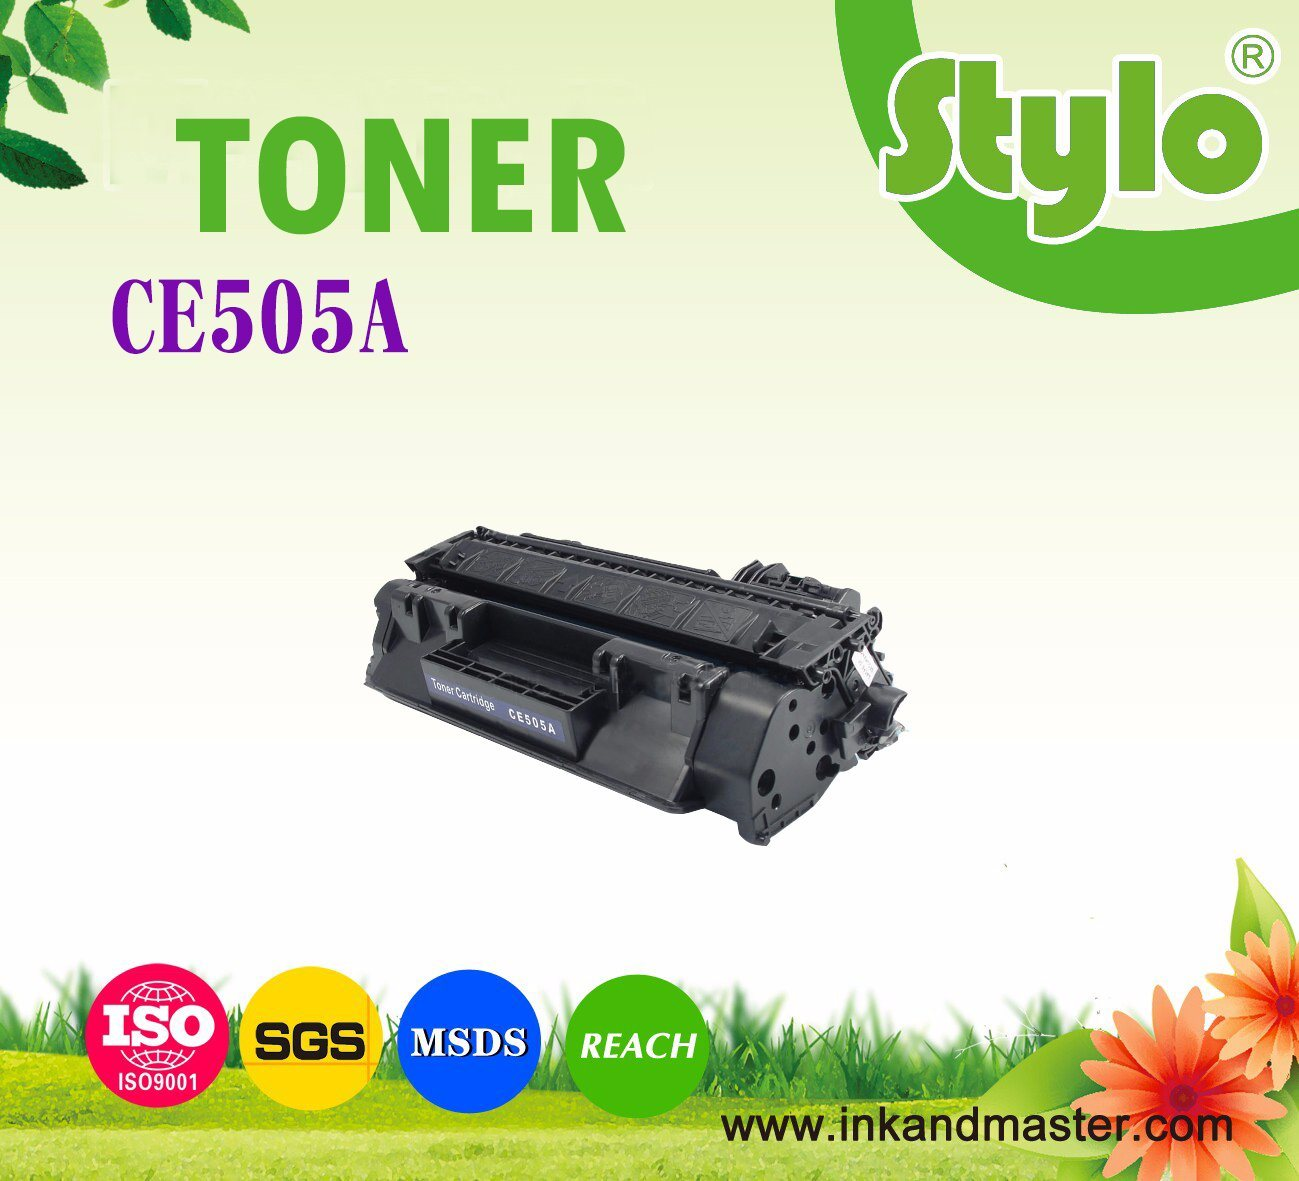 Ce505A Toner Cartridge for HP Laserjet Printer